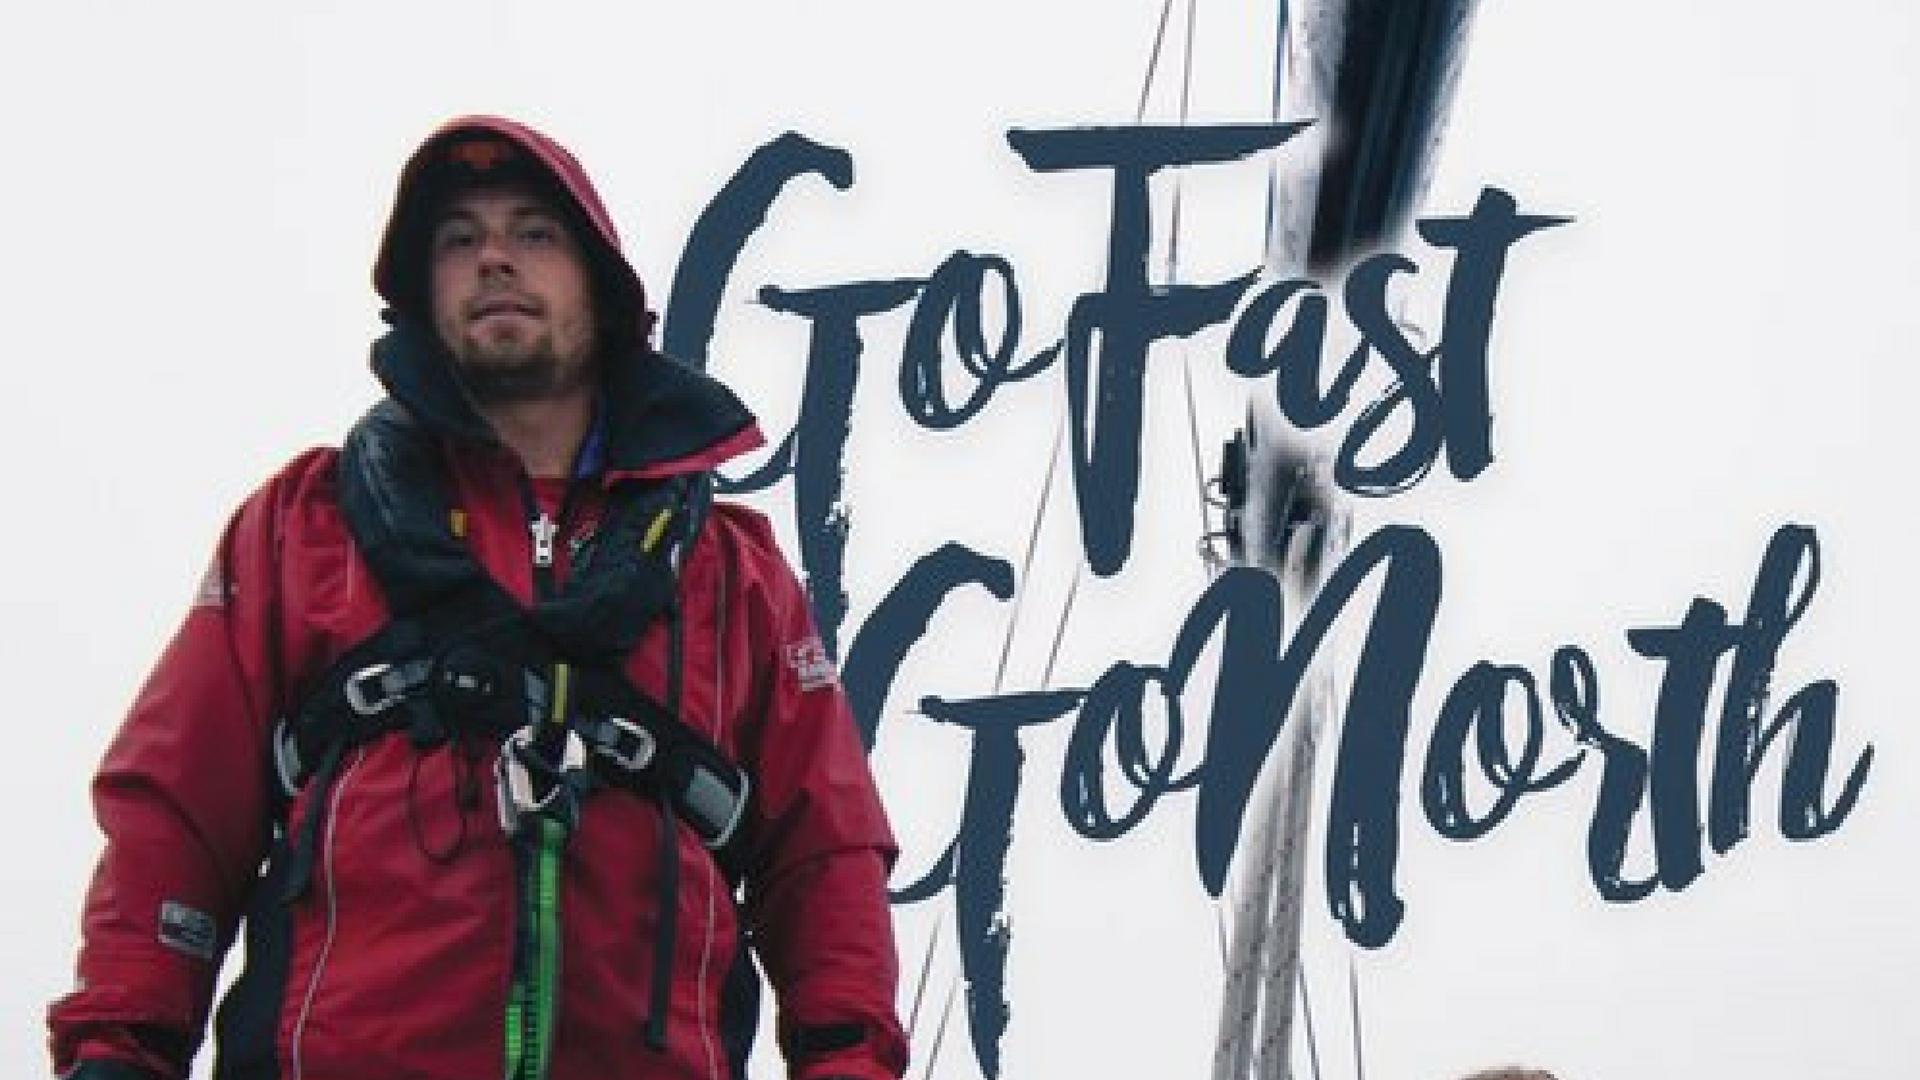 Go Fast. Go North.